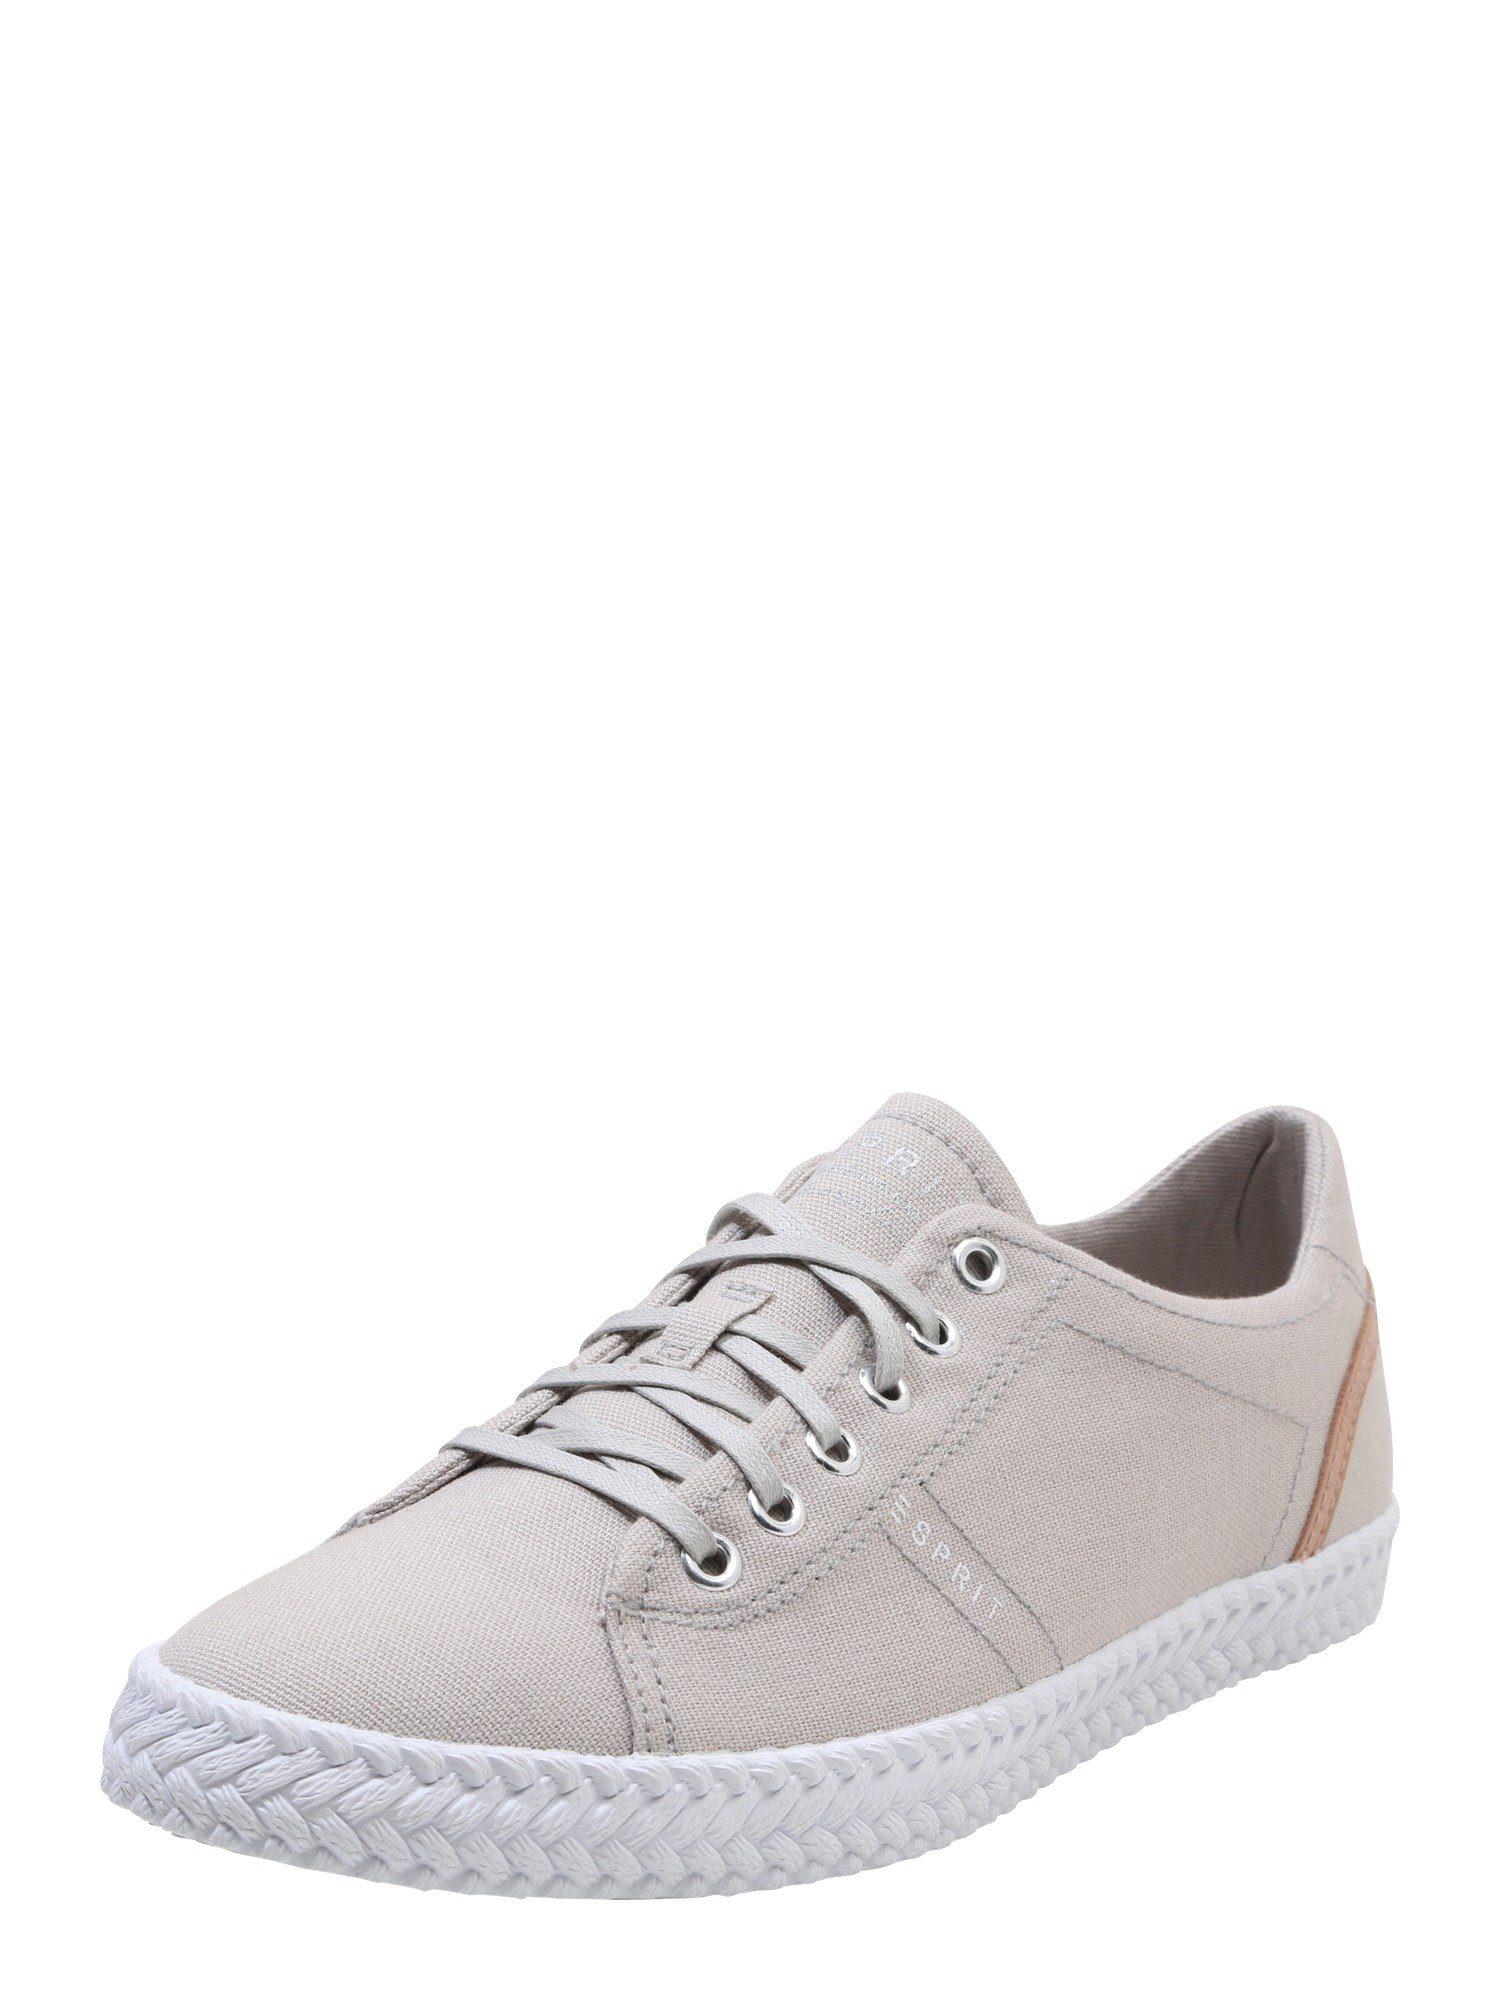 Esprit »Silvana Lace up« Sneaker